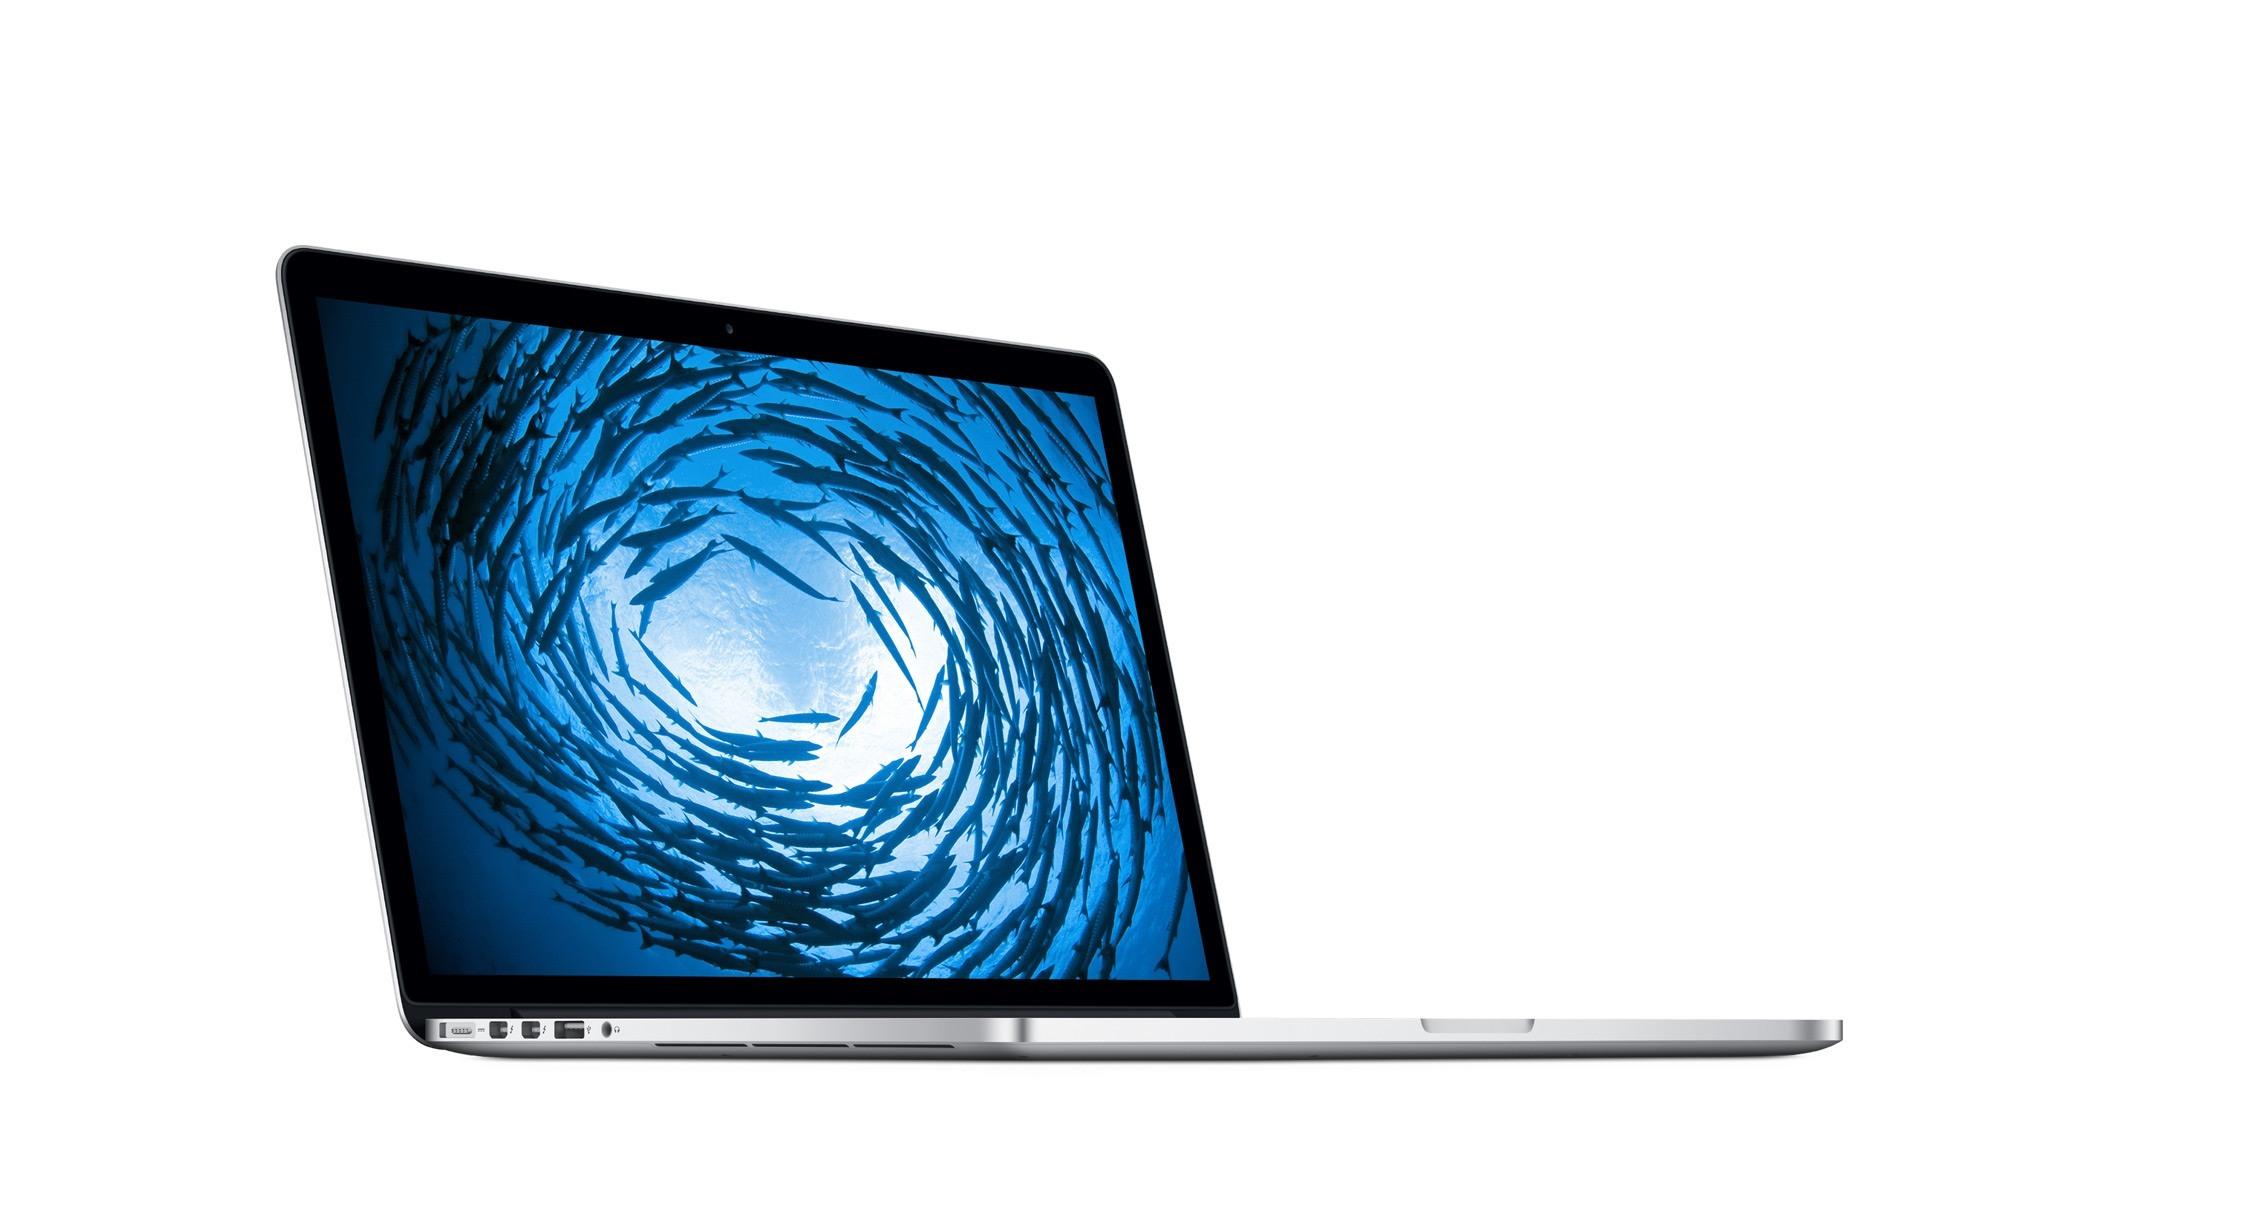 apple-macbook-pro-retina-15-inc-190515